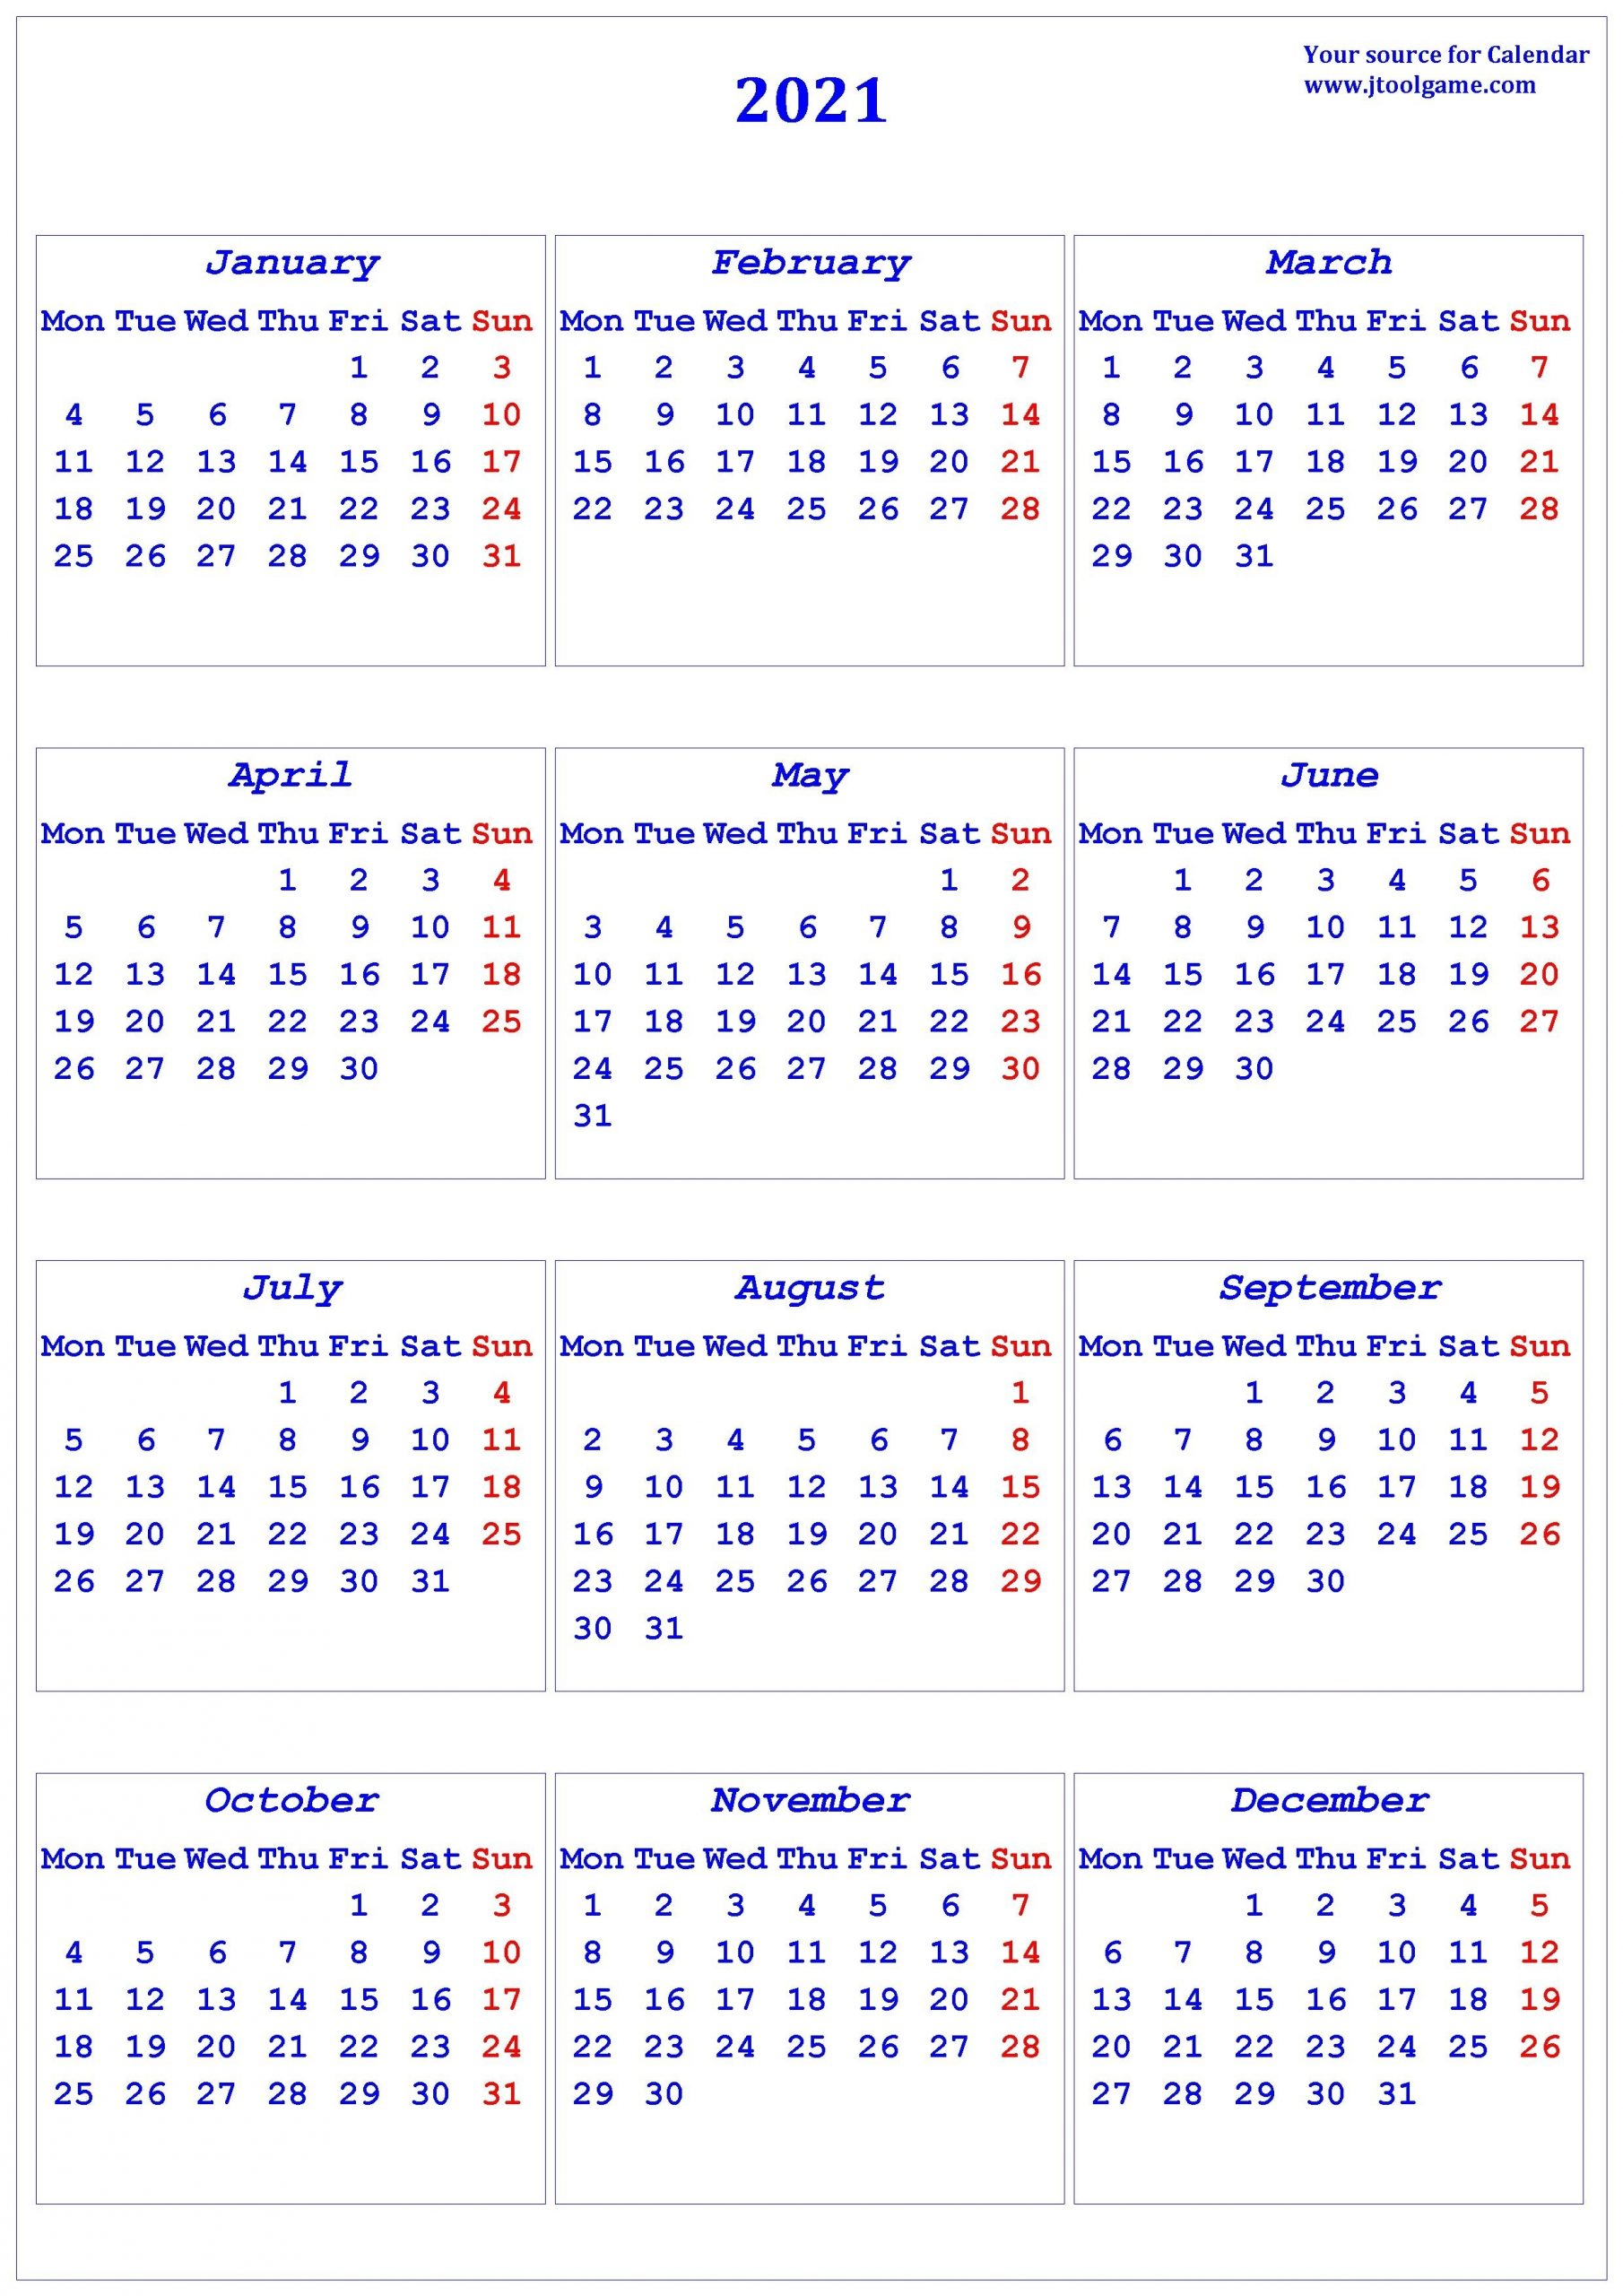 2021 Calendar - Printable Calendar With Usa Holidays